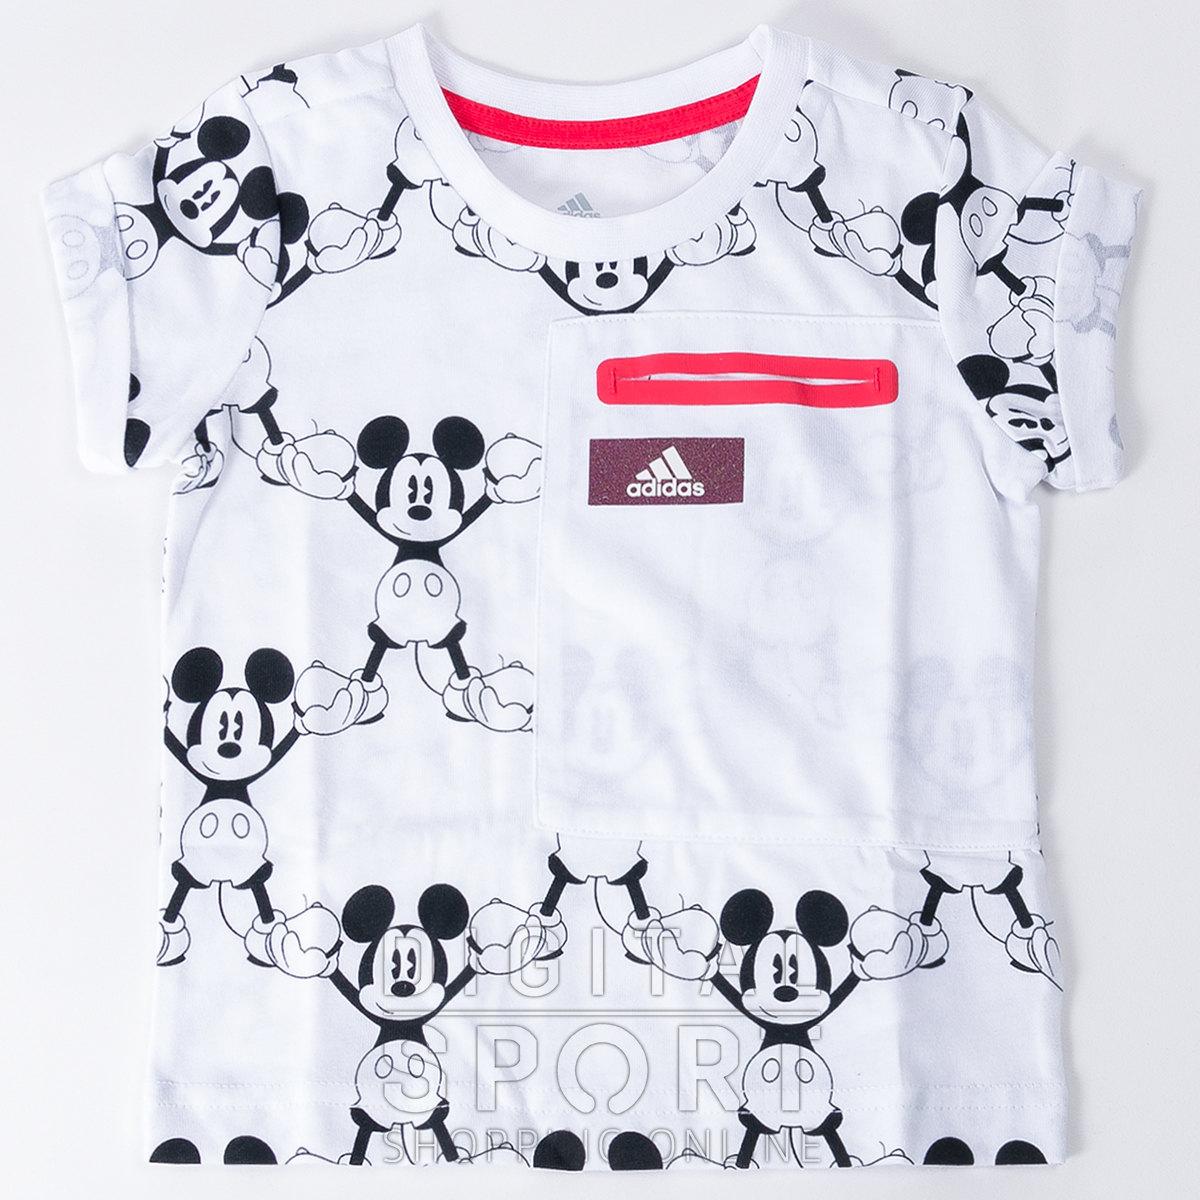 Remera Mickey Adidas Mouse Mouse Mouse Remera Remera Adidas Mickey Adidas Mickey xdCBroe